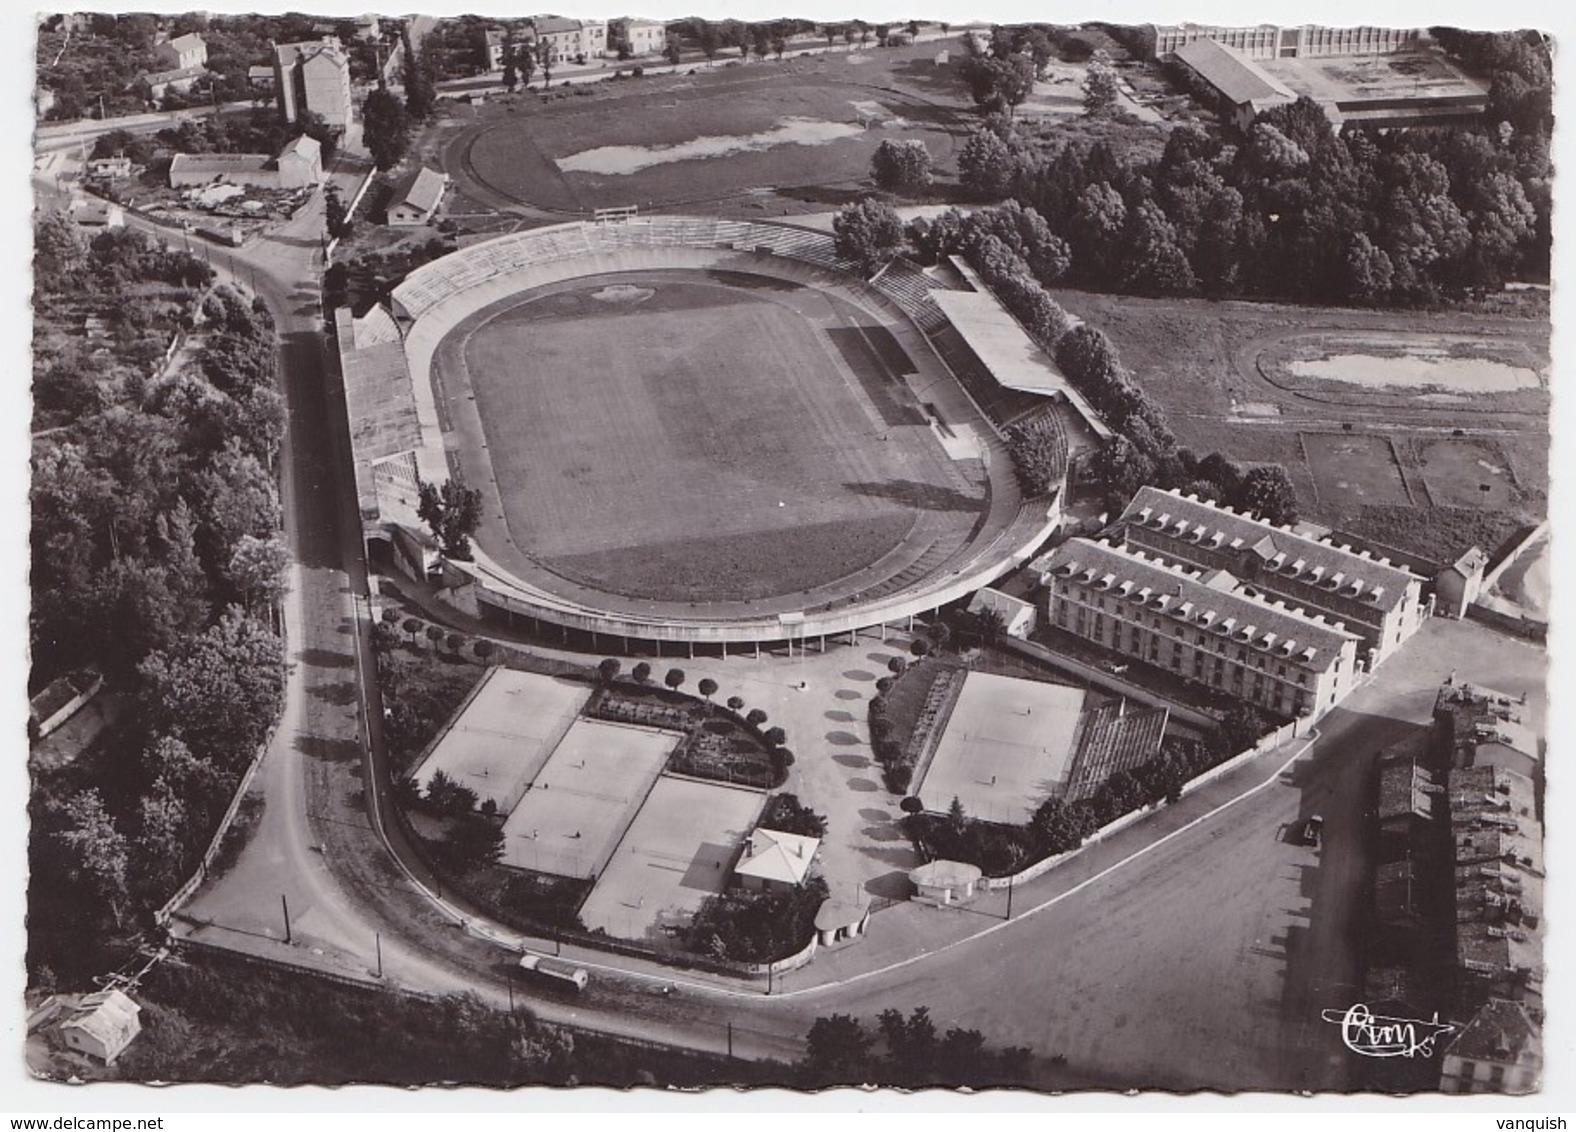 GRENOBLE STADE CHARLES-BERTY STADIUM ESTADIO STADION STADIO - Football